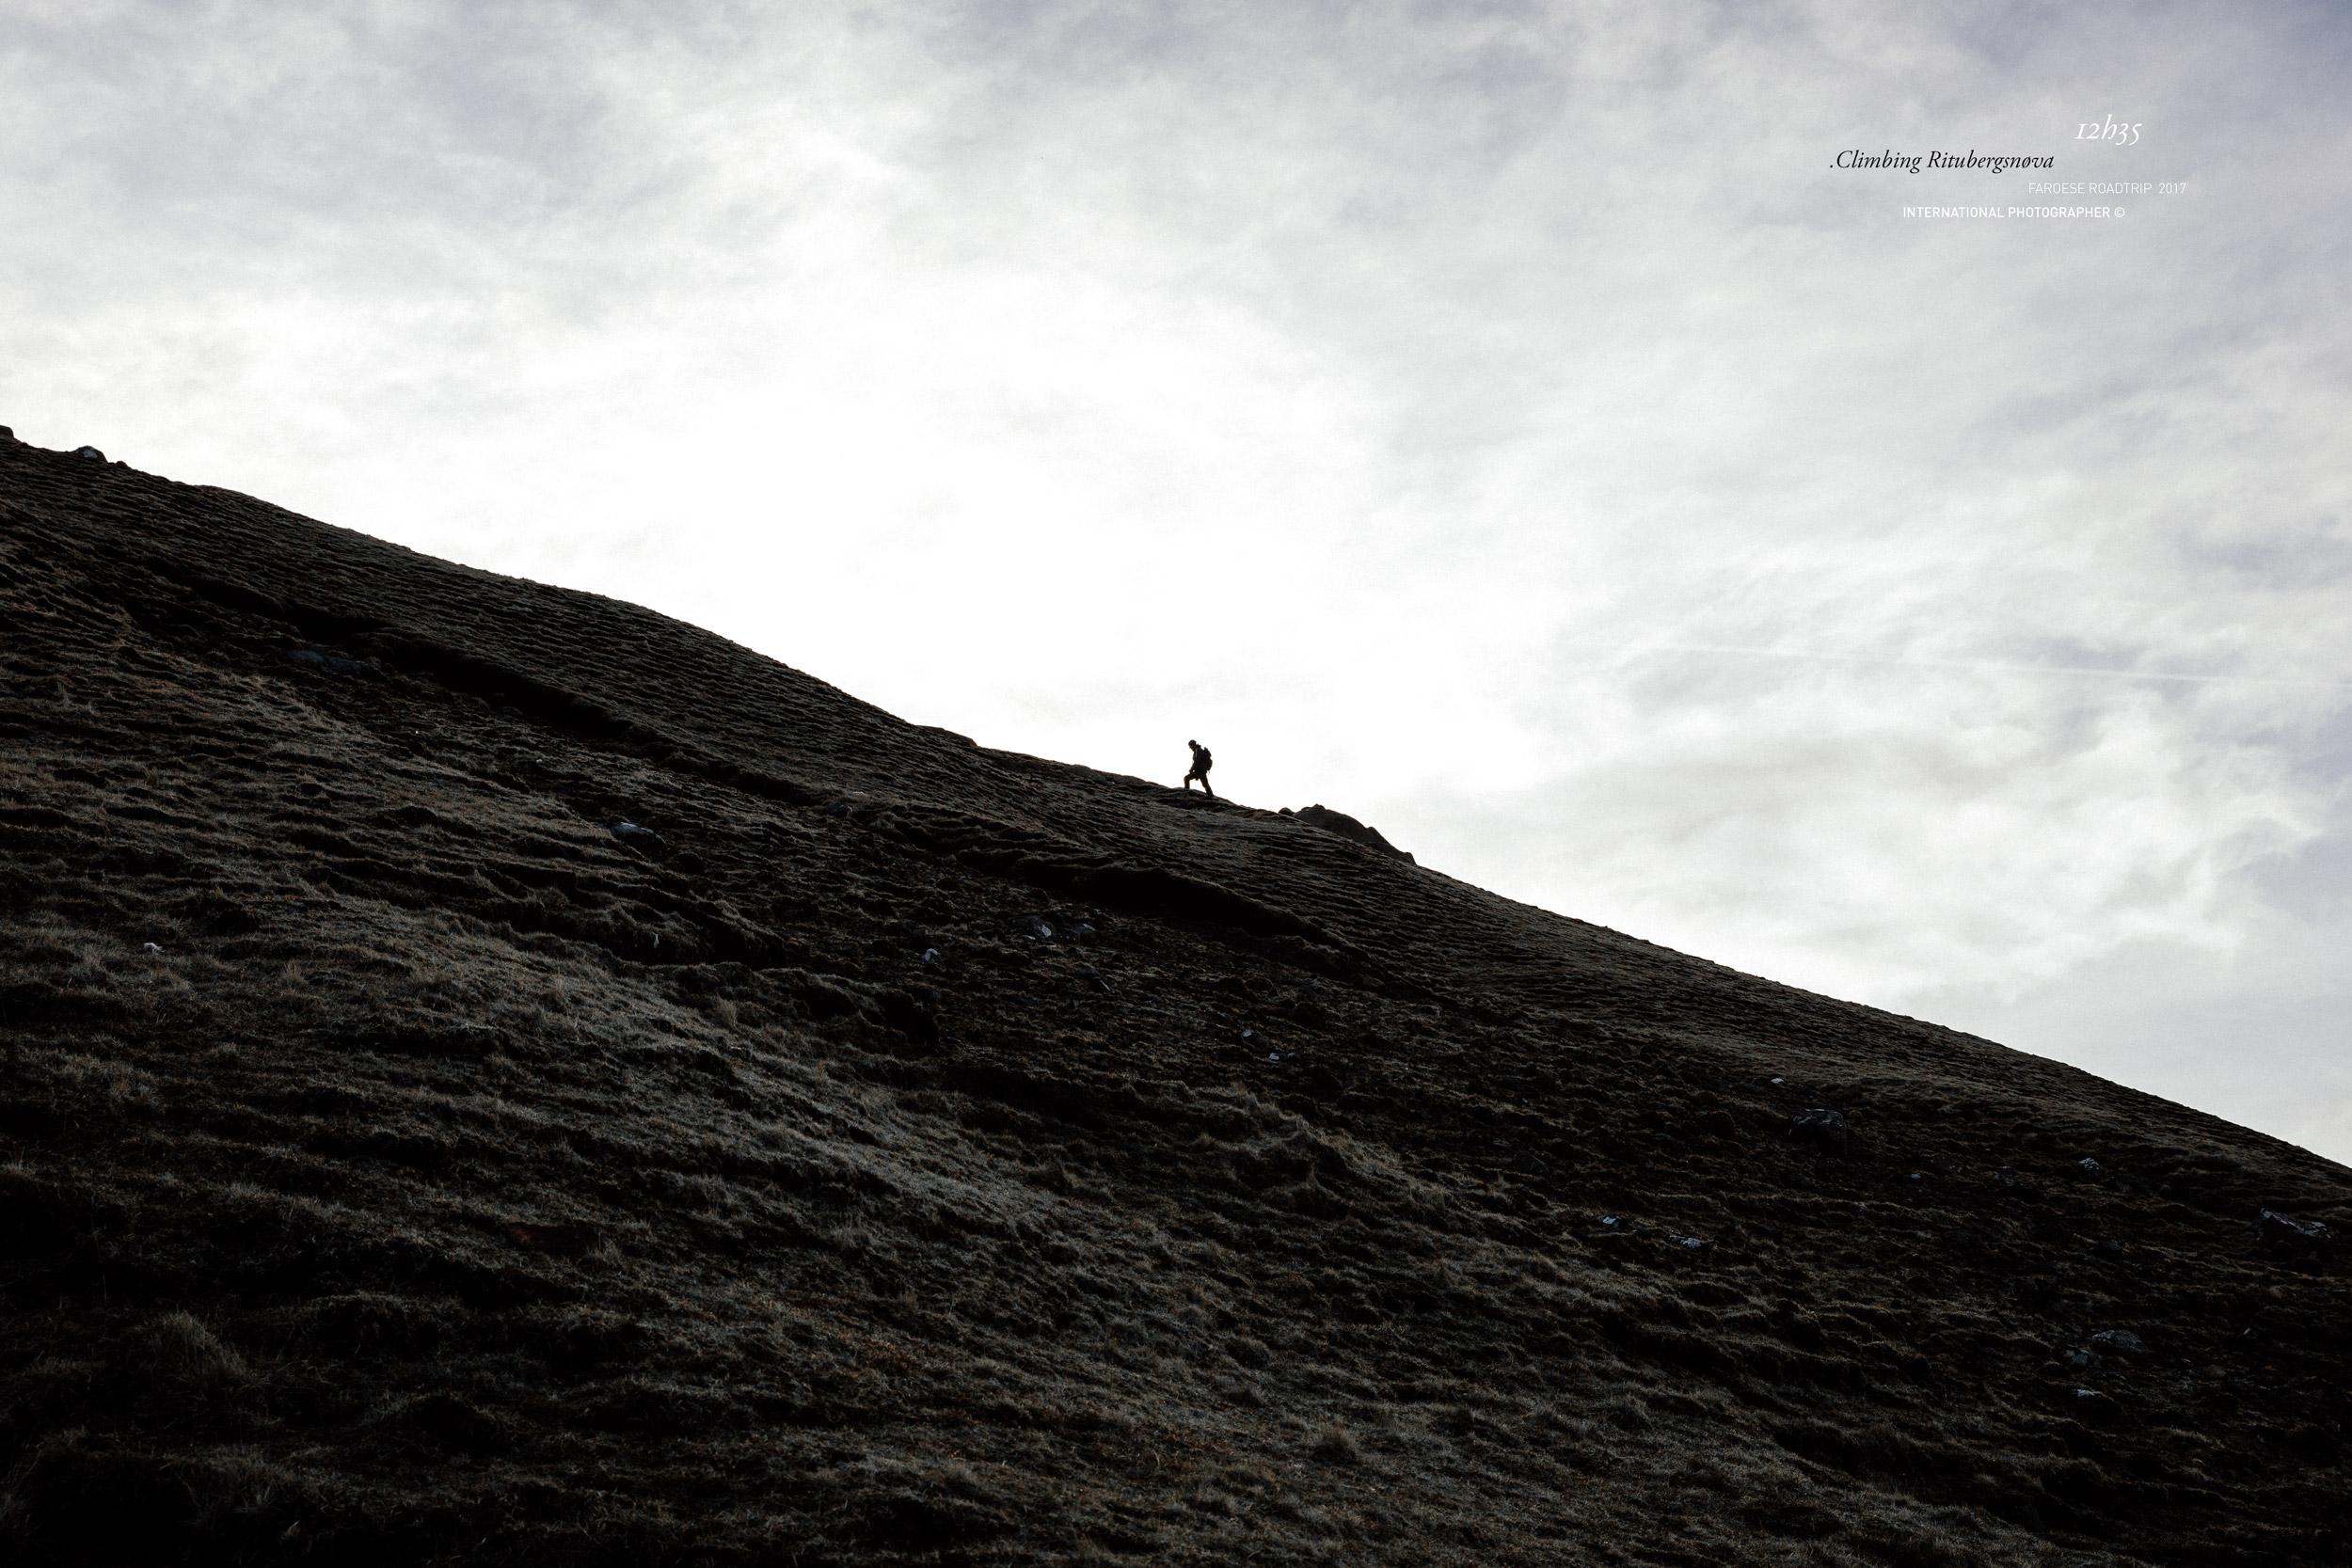 Balade sur les falaises de Ritubergsnøva